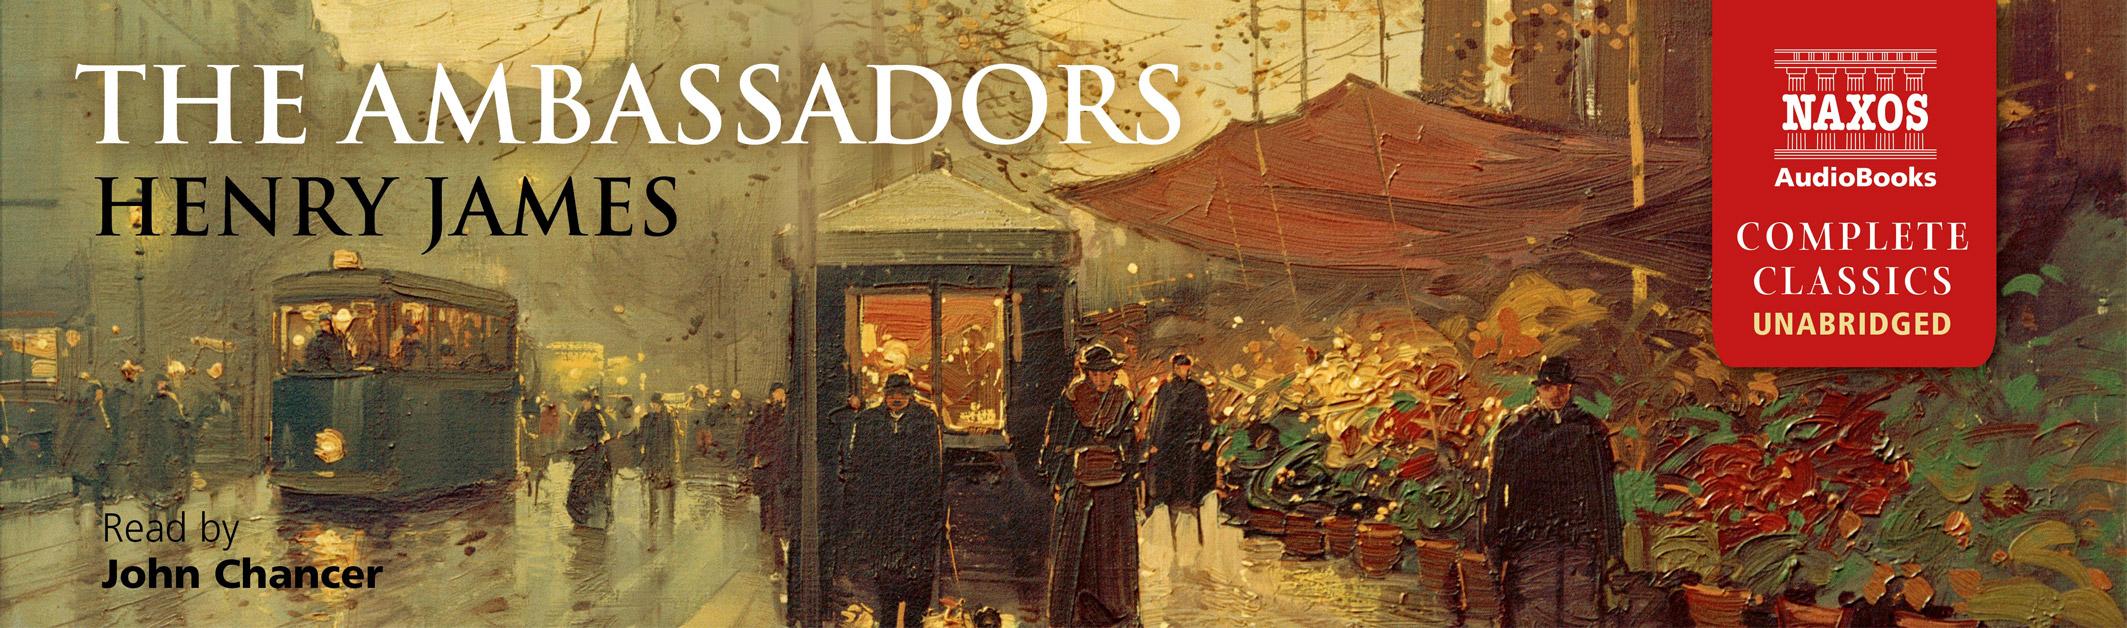 The Ambassadors (unabridged)